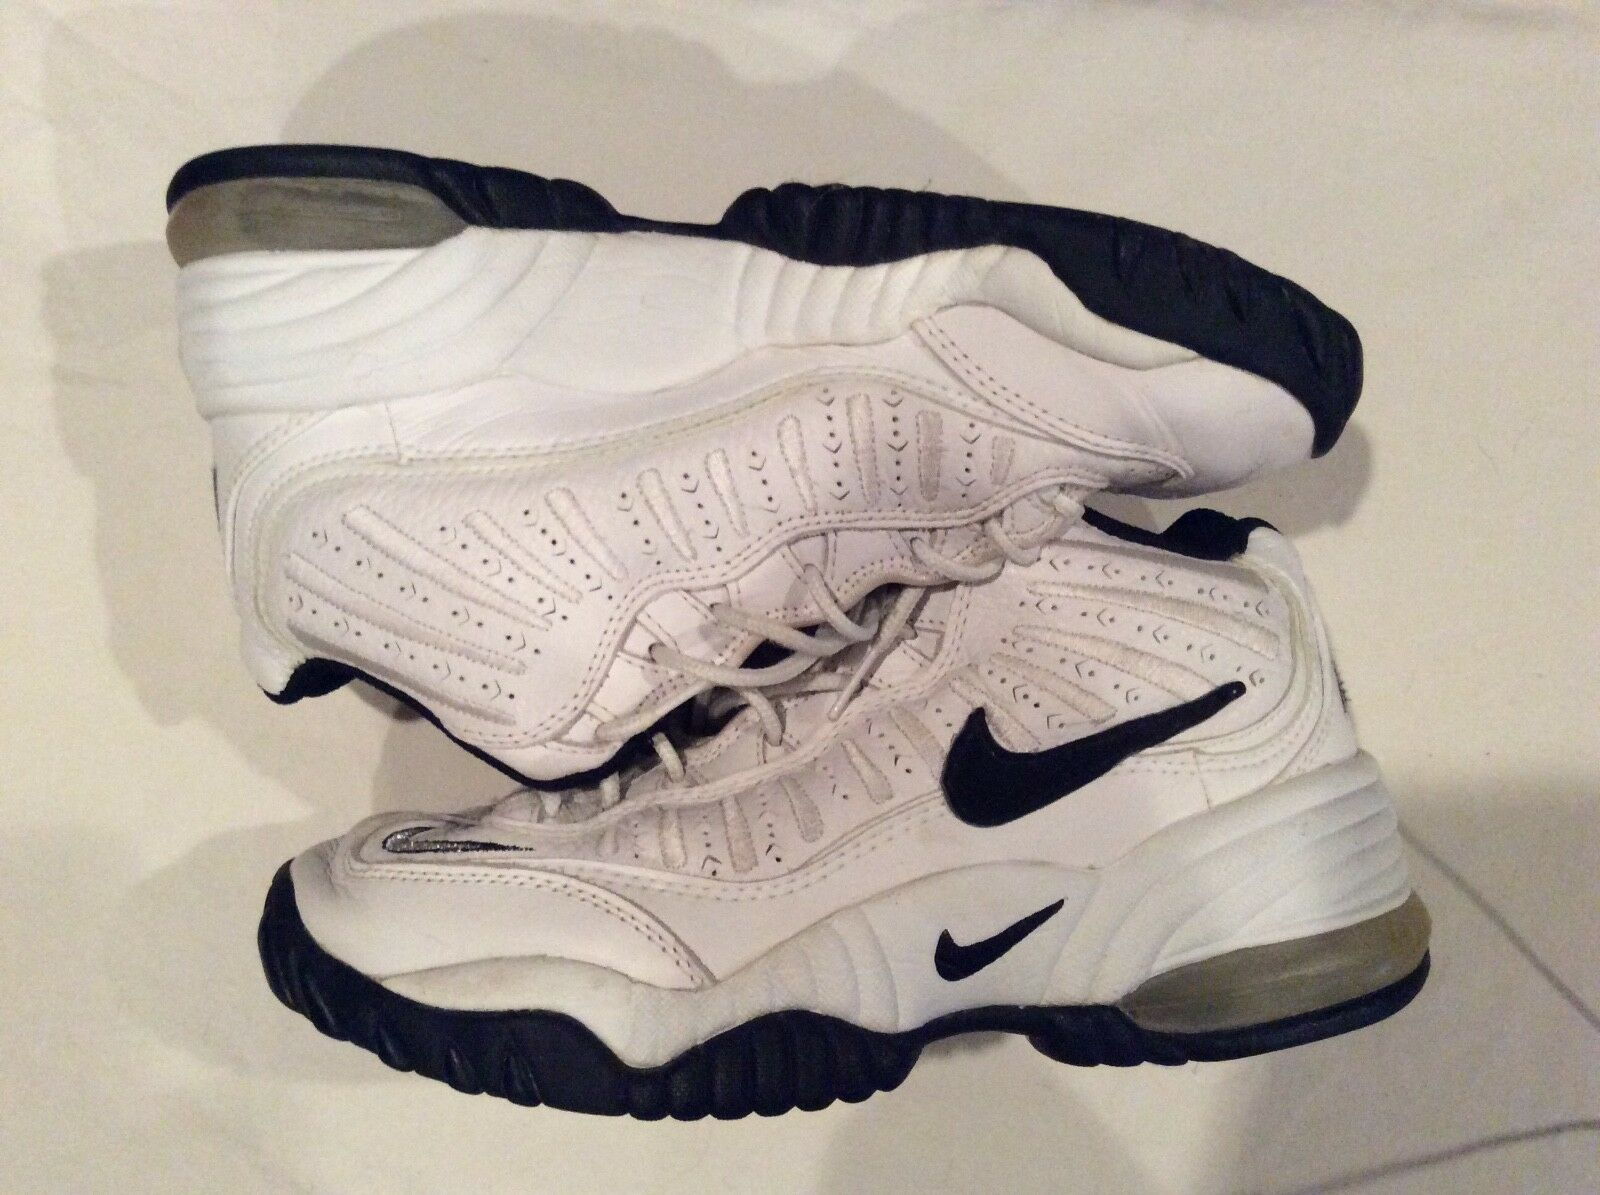 Nike Men's Vintage White Hightop Hightop Hightop Basketball Shoes, size 9 01192e